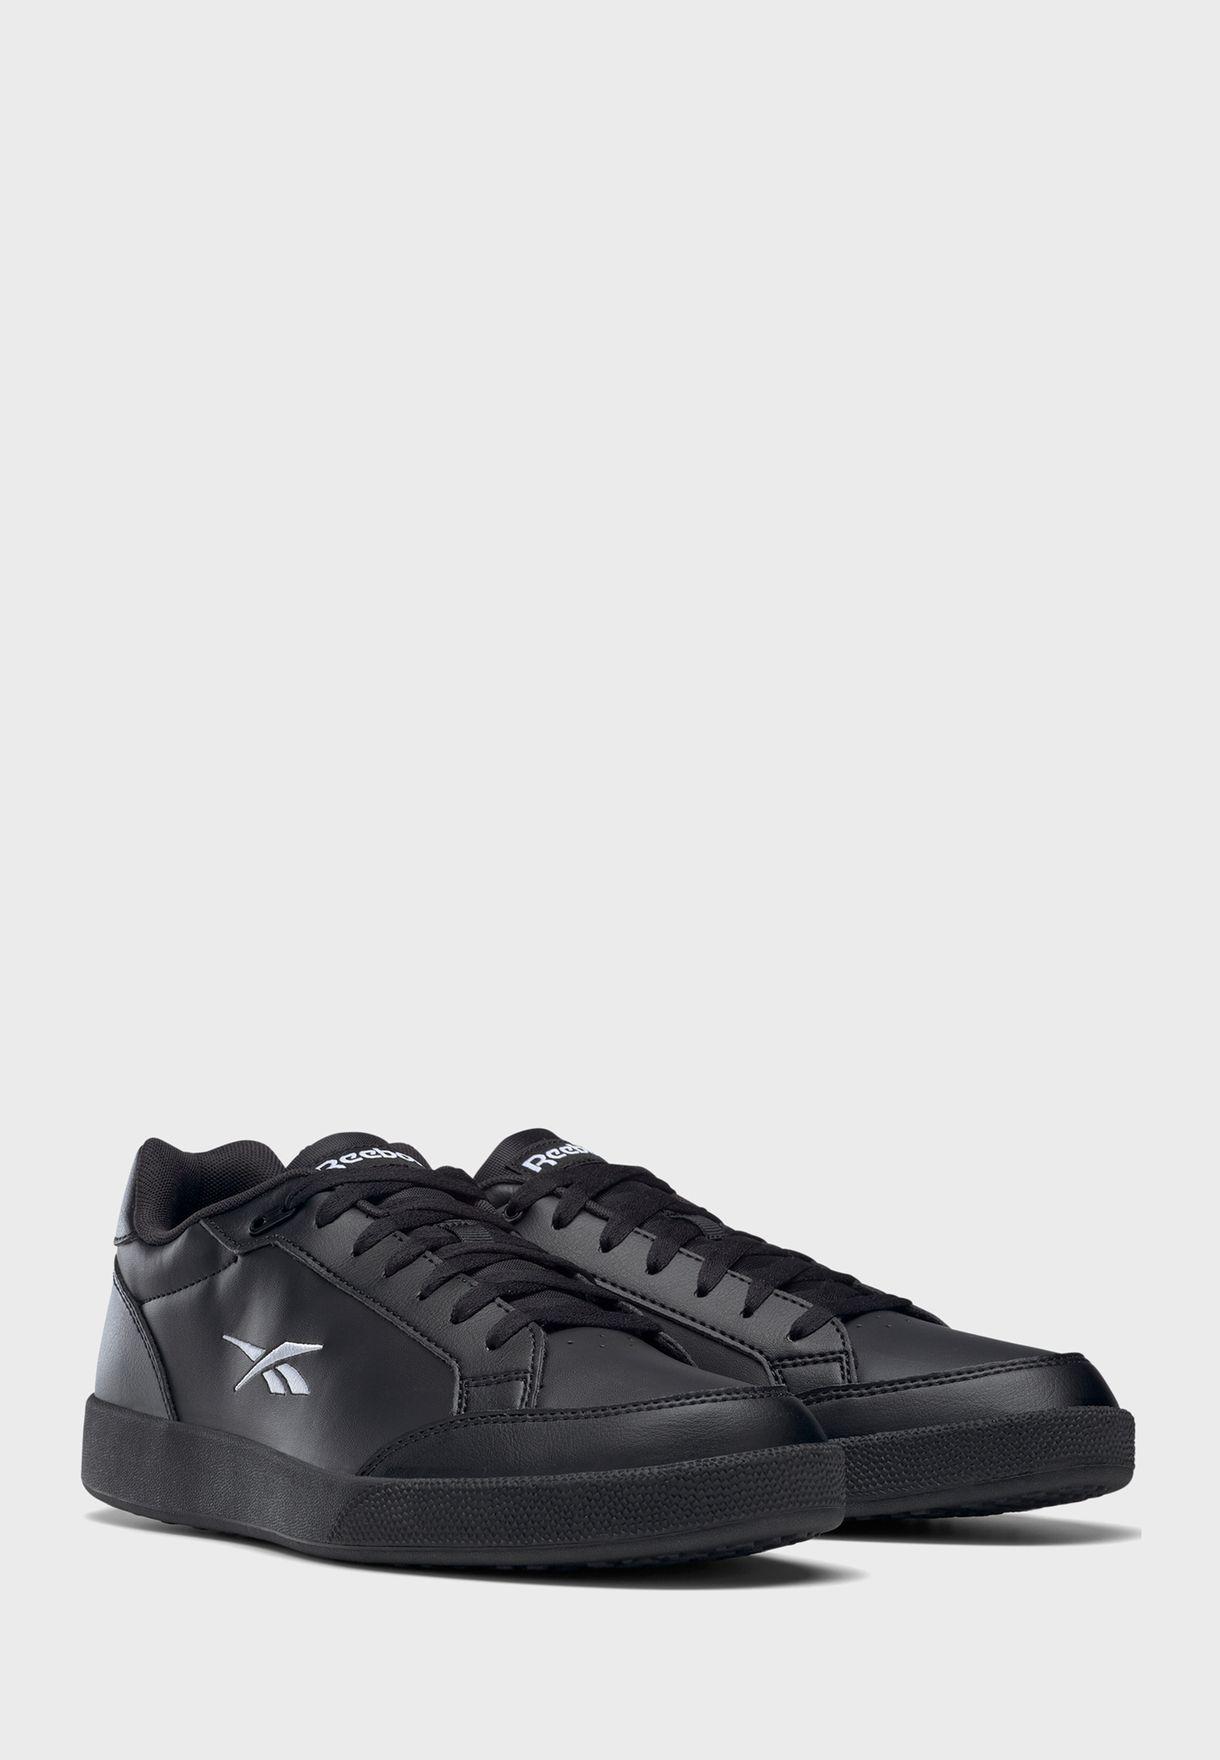 حذاء فيكتور سماش